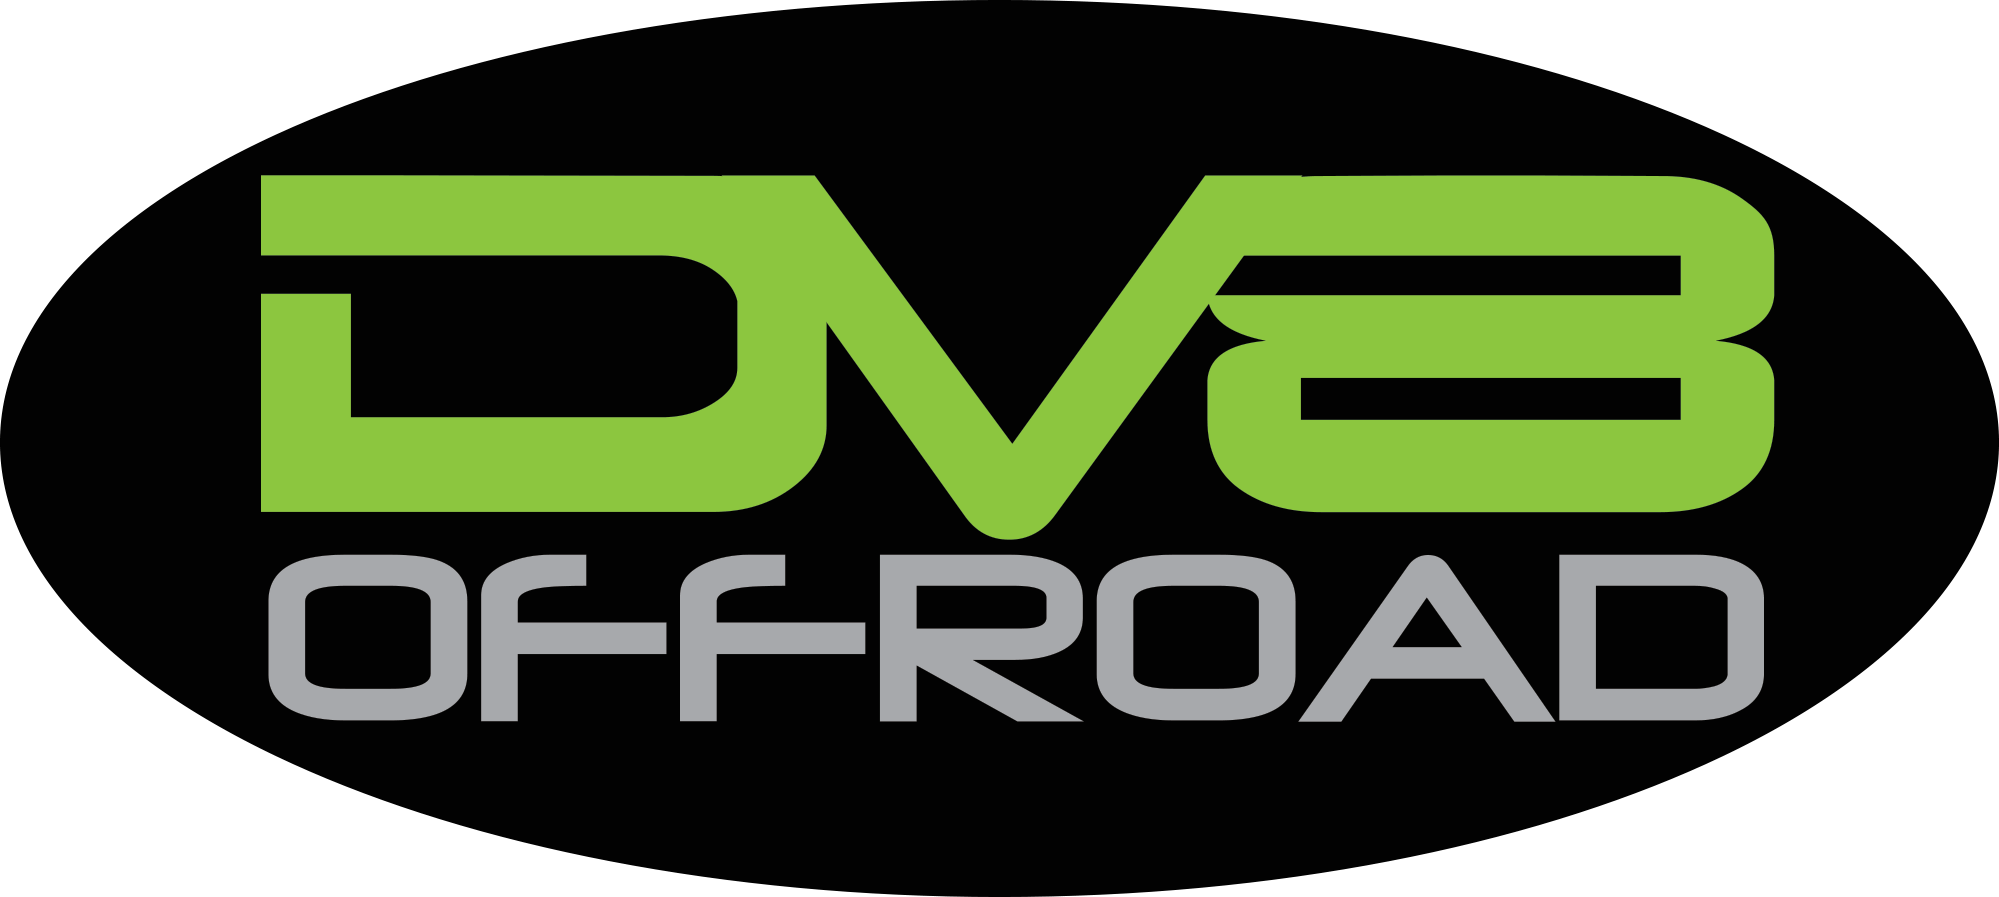 Dv8 Off Road